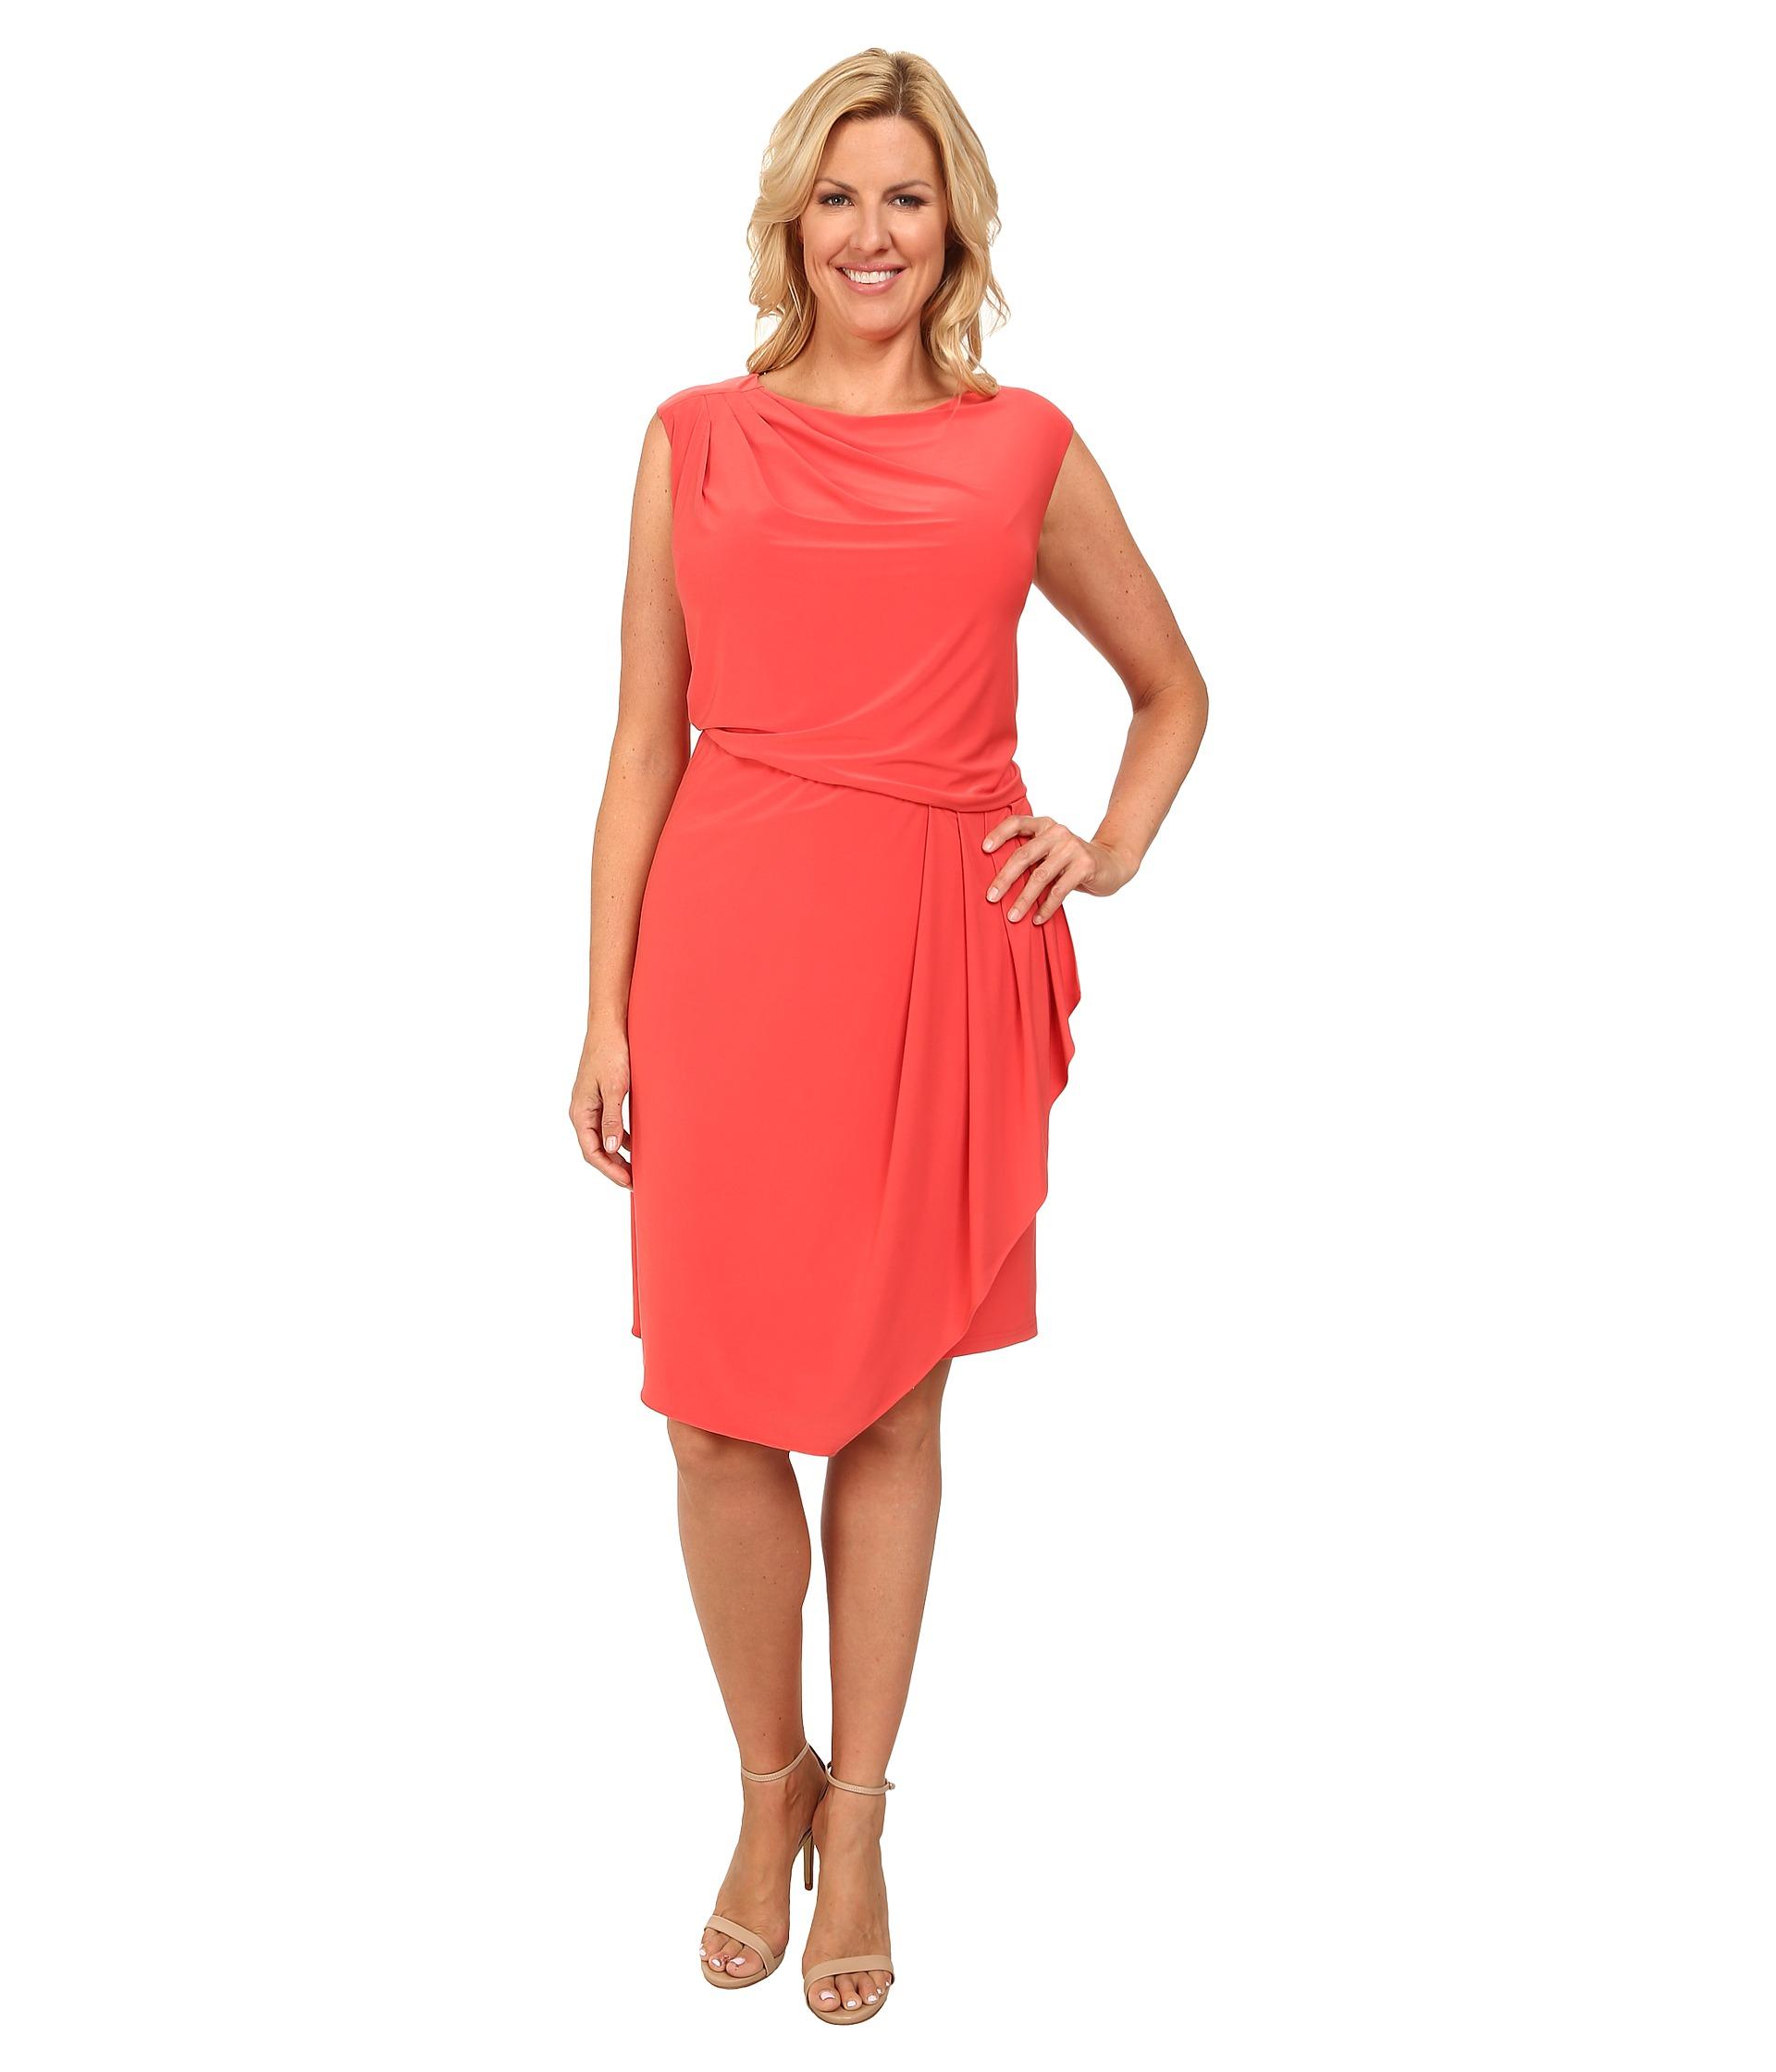 Asymmetric Drape Dress: Adrianna Papell Plus Size Asymmetrical Drape Jersey Dress